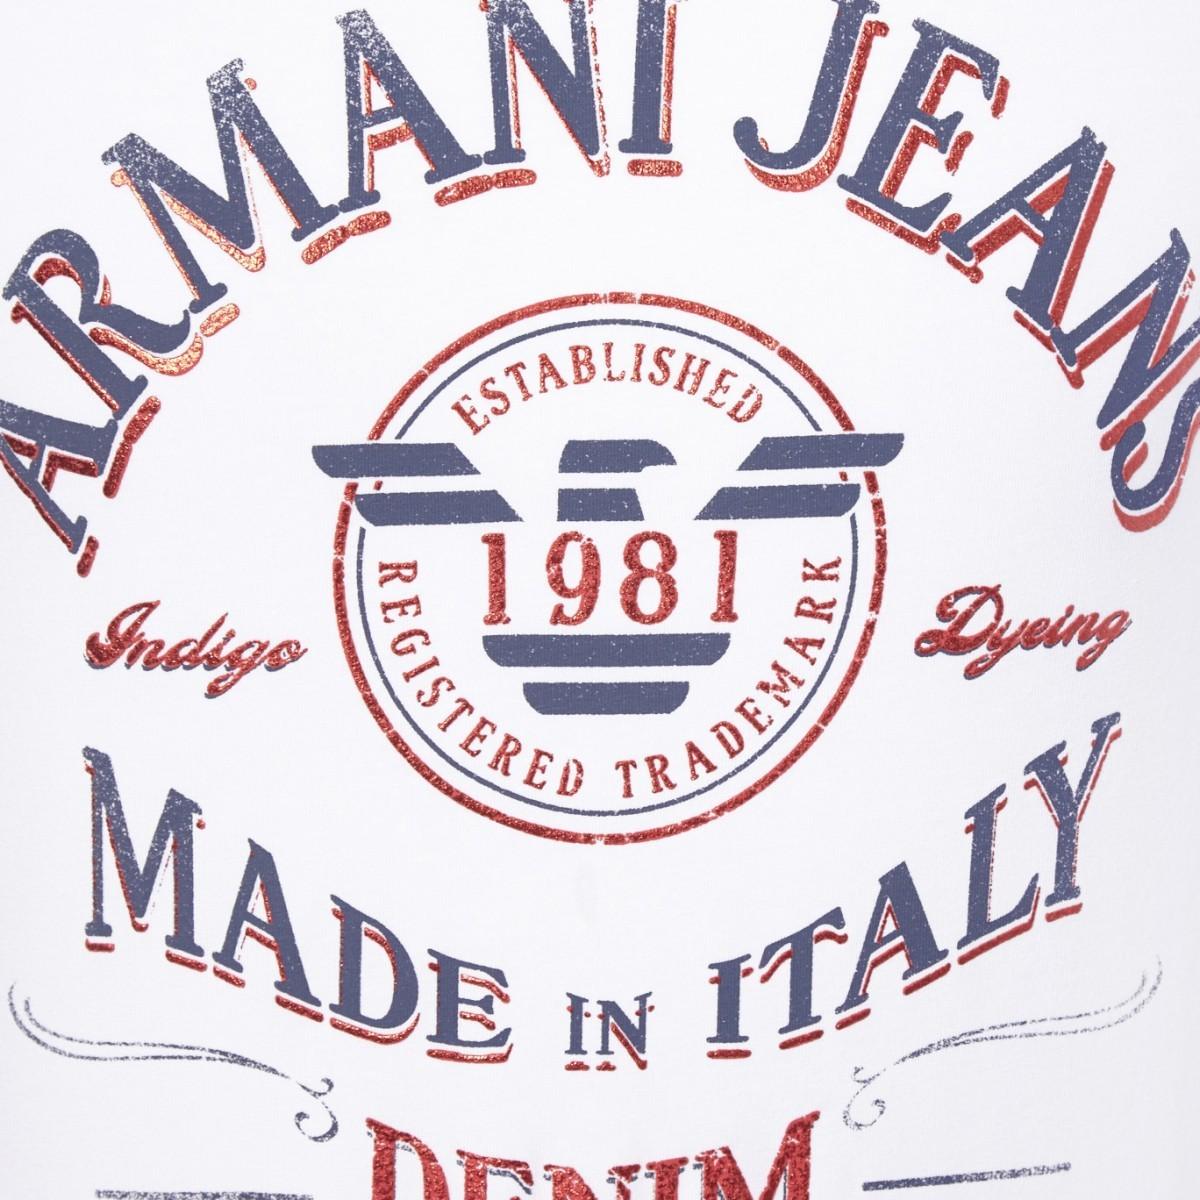 armani jeans/阿玛尼牛仔 男士t恤 c6h10 nm 10